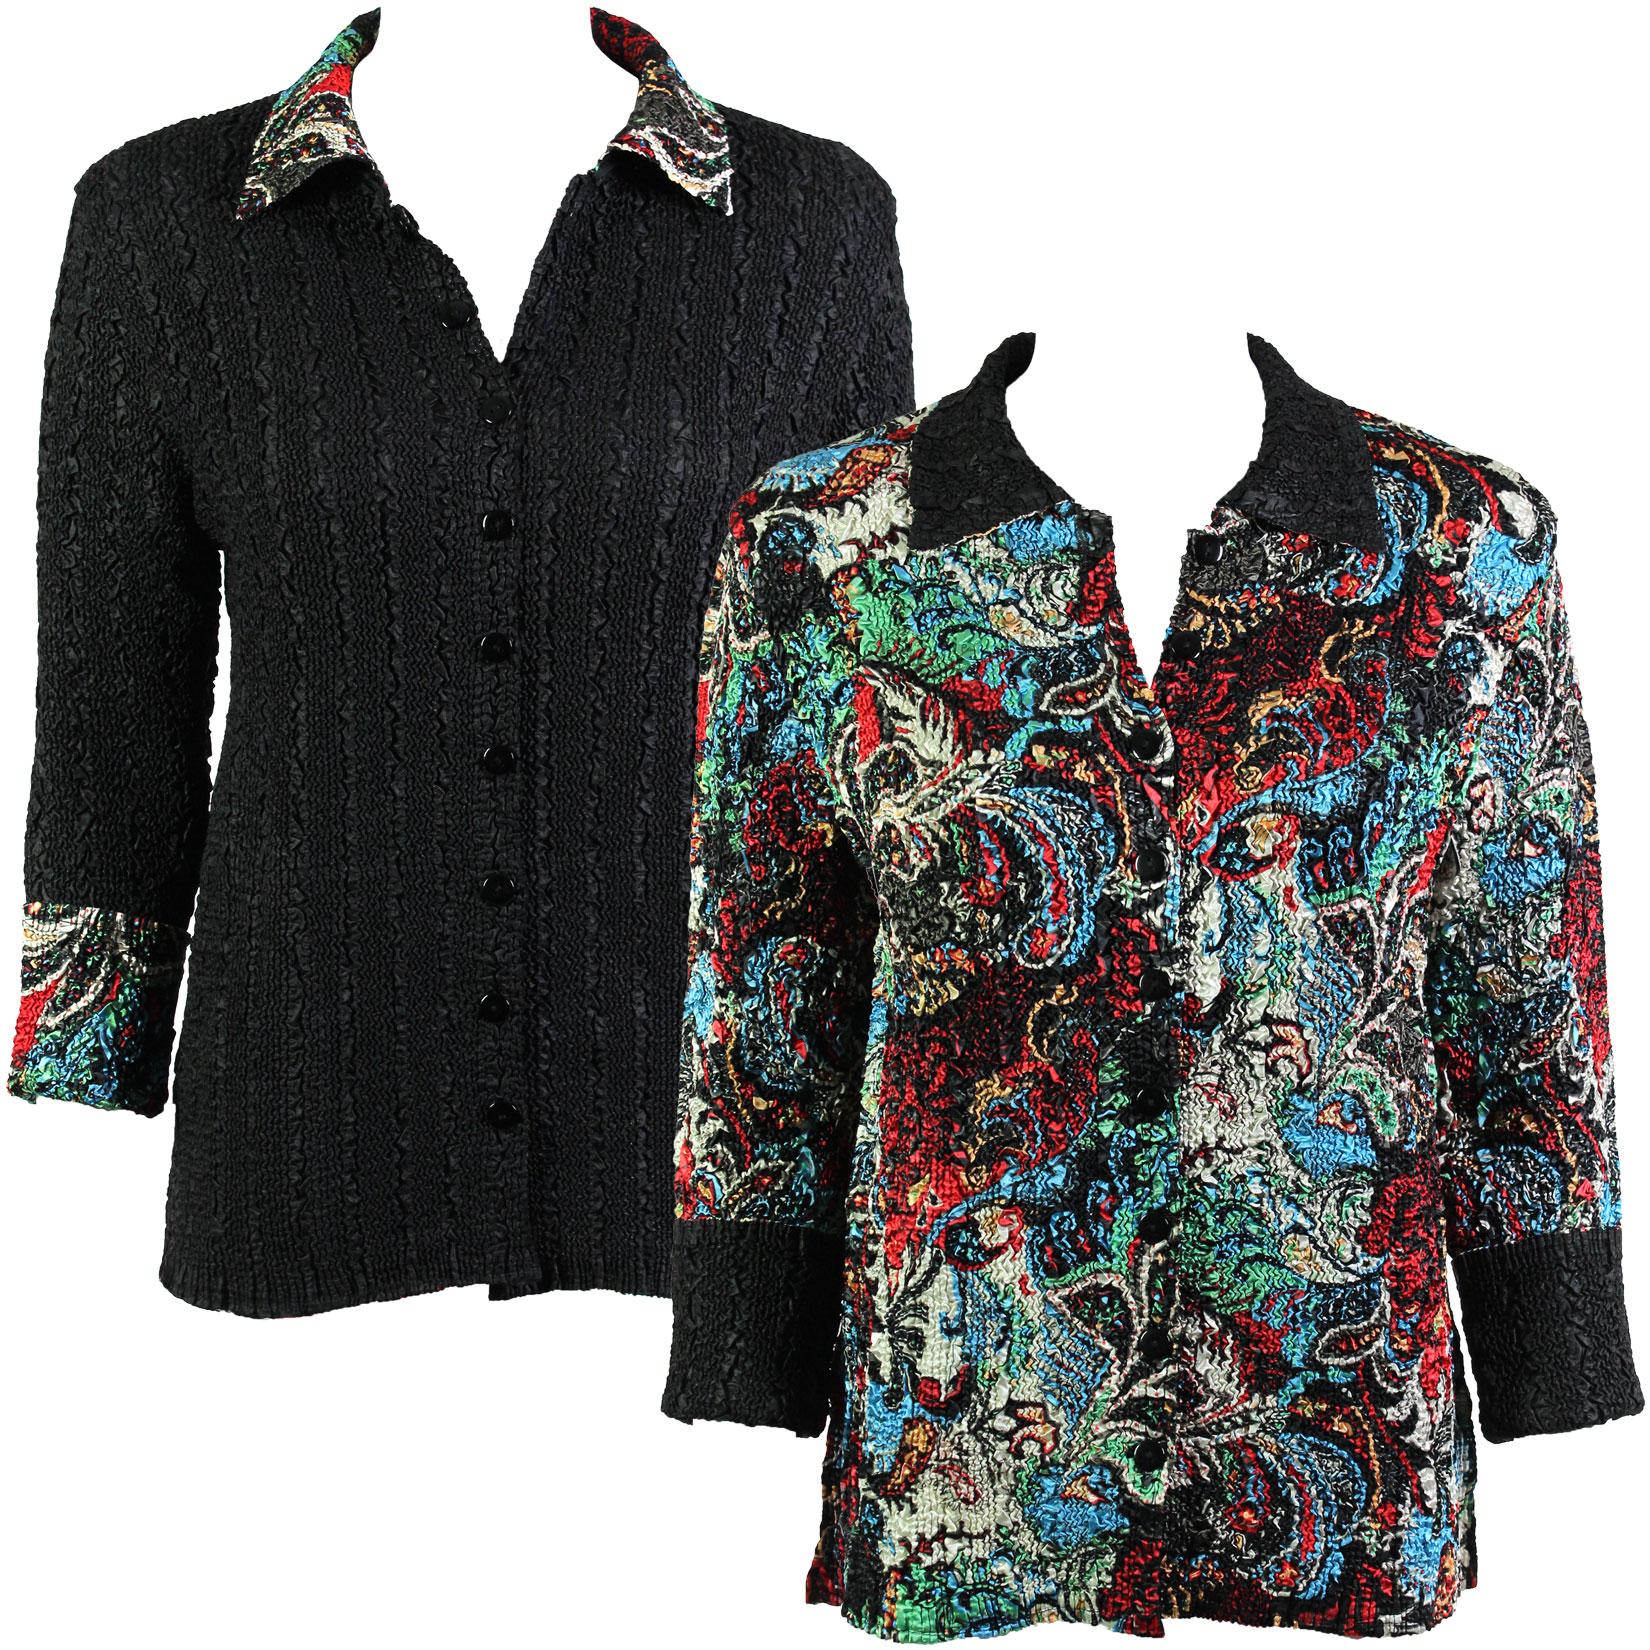 Wholesale Magic Crush - Reversible Jackets #3002 Multi Colored Paisley - L-XL